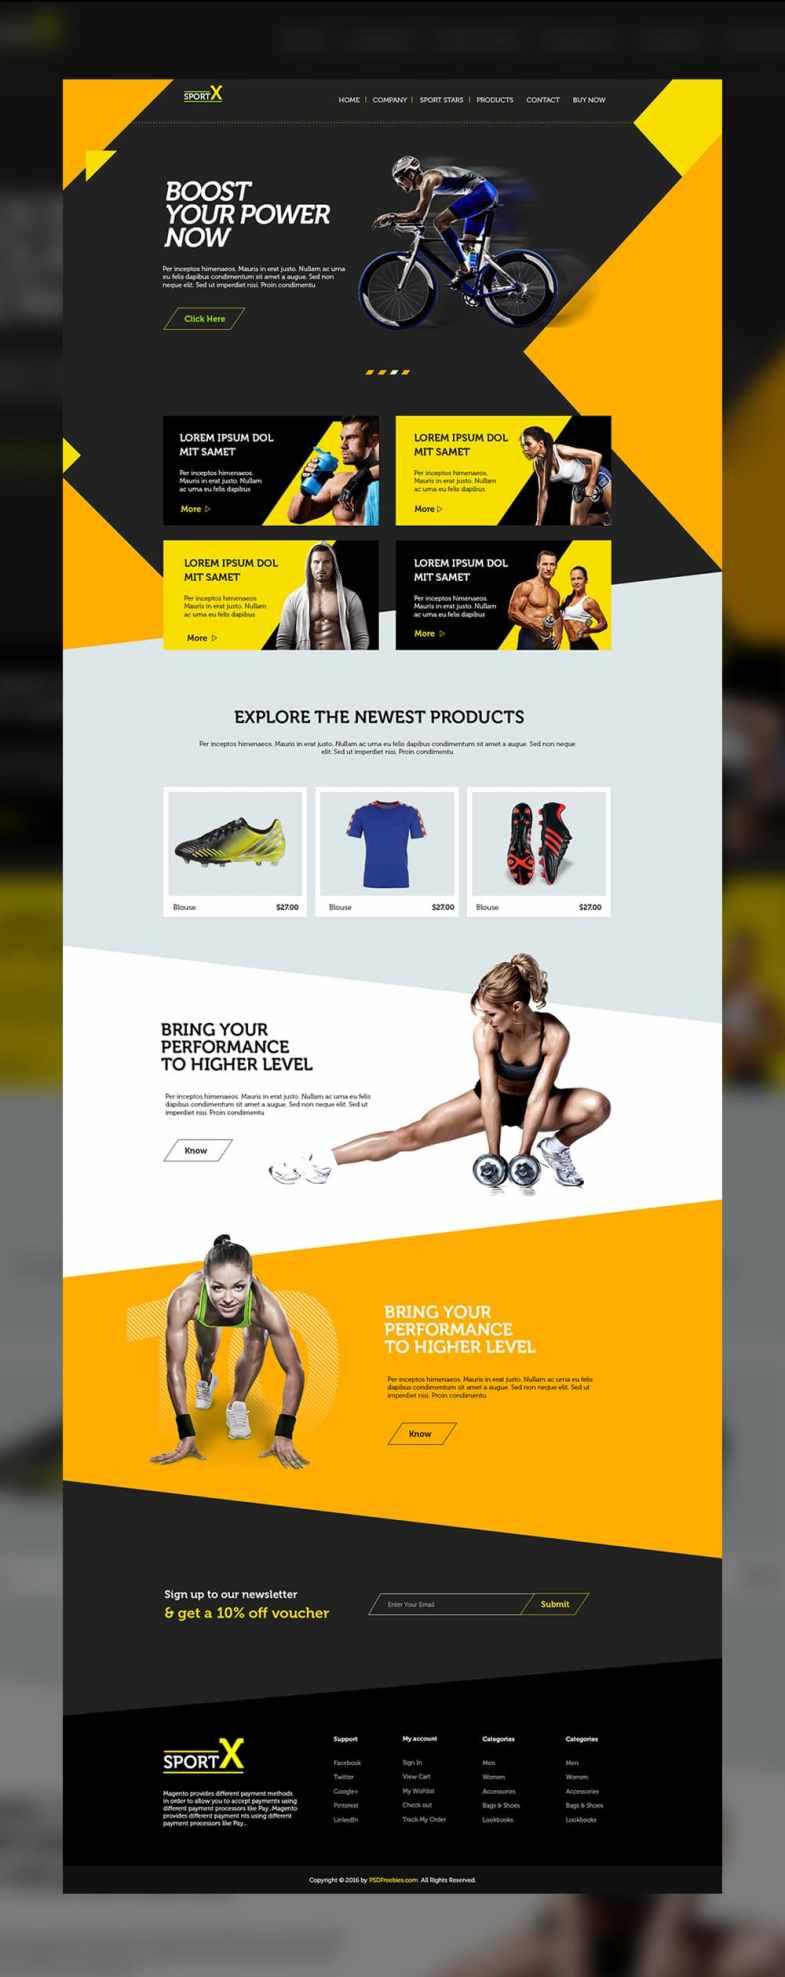 Sports Shop Multipurpose Web Template PSD Бесплатные шаблоны для интернет-магазина psd - Sports Shop Multipurpose Web Template PSD - Бесплатные шаблоны для интернет-магазина PSD